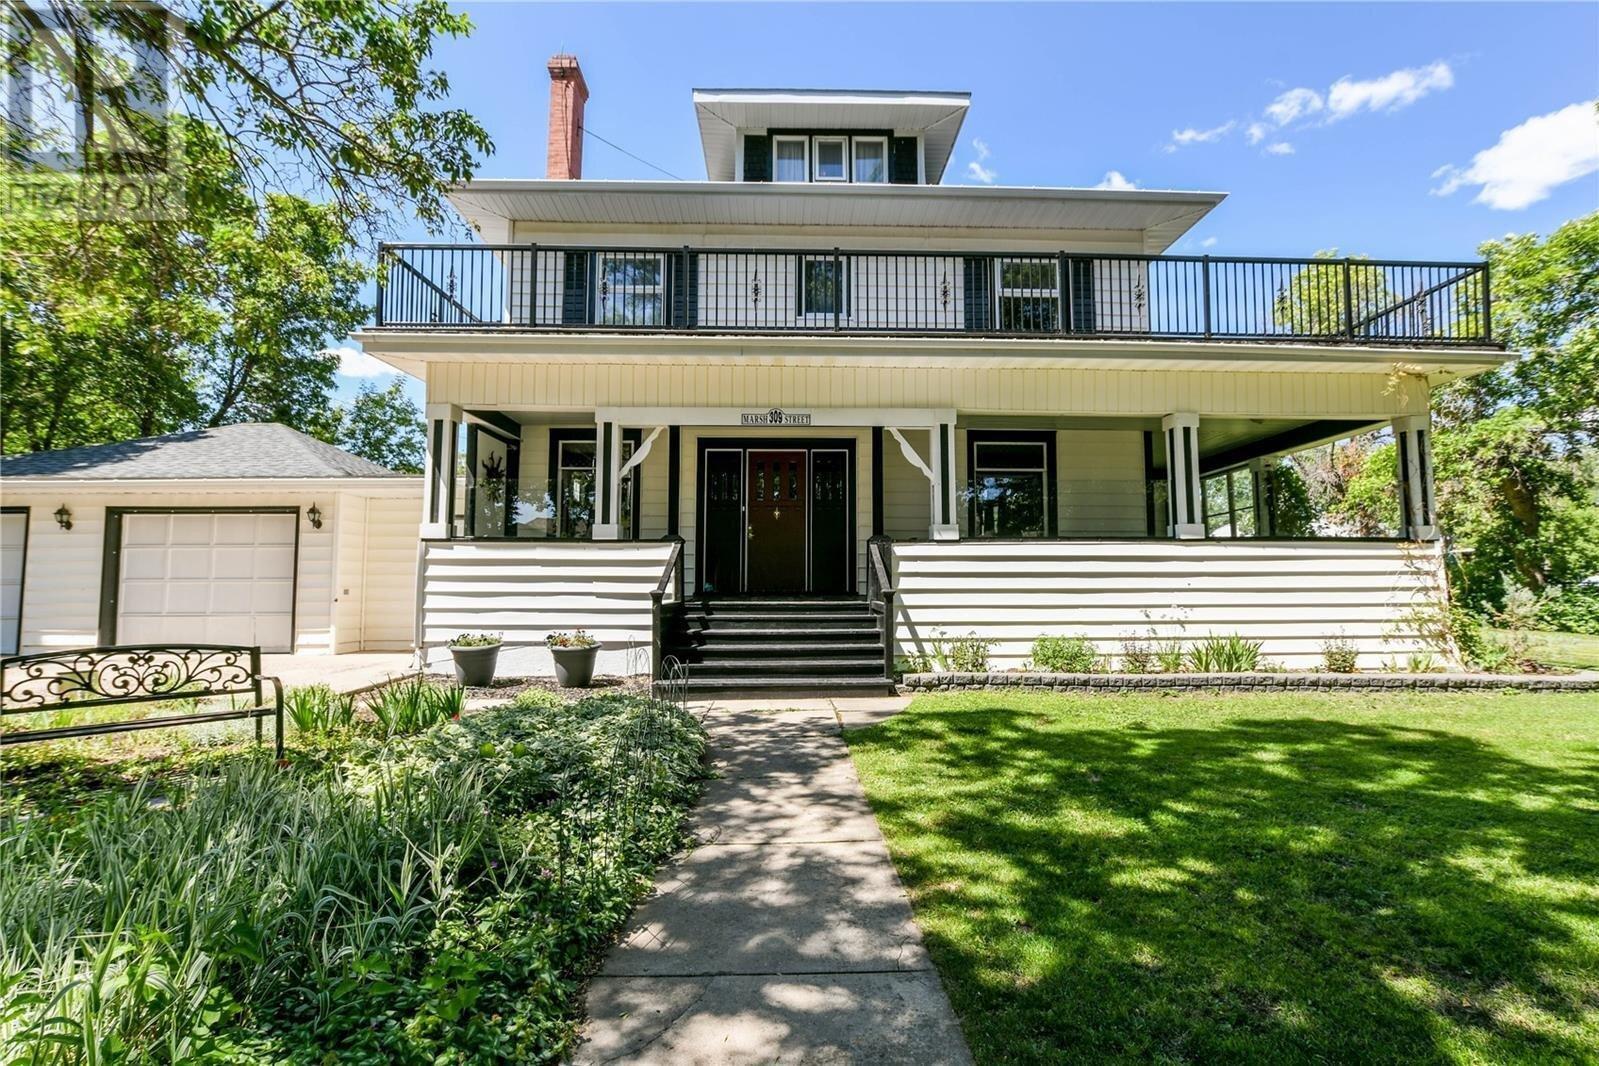 House for sale at 309 Marsh St Maple Creek Saskatchewan - MLS: SK818758